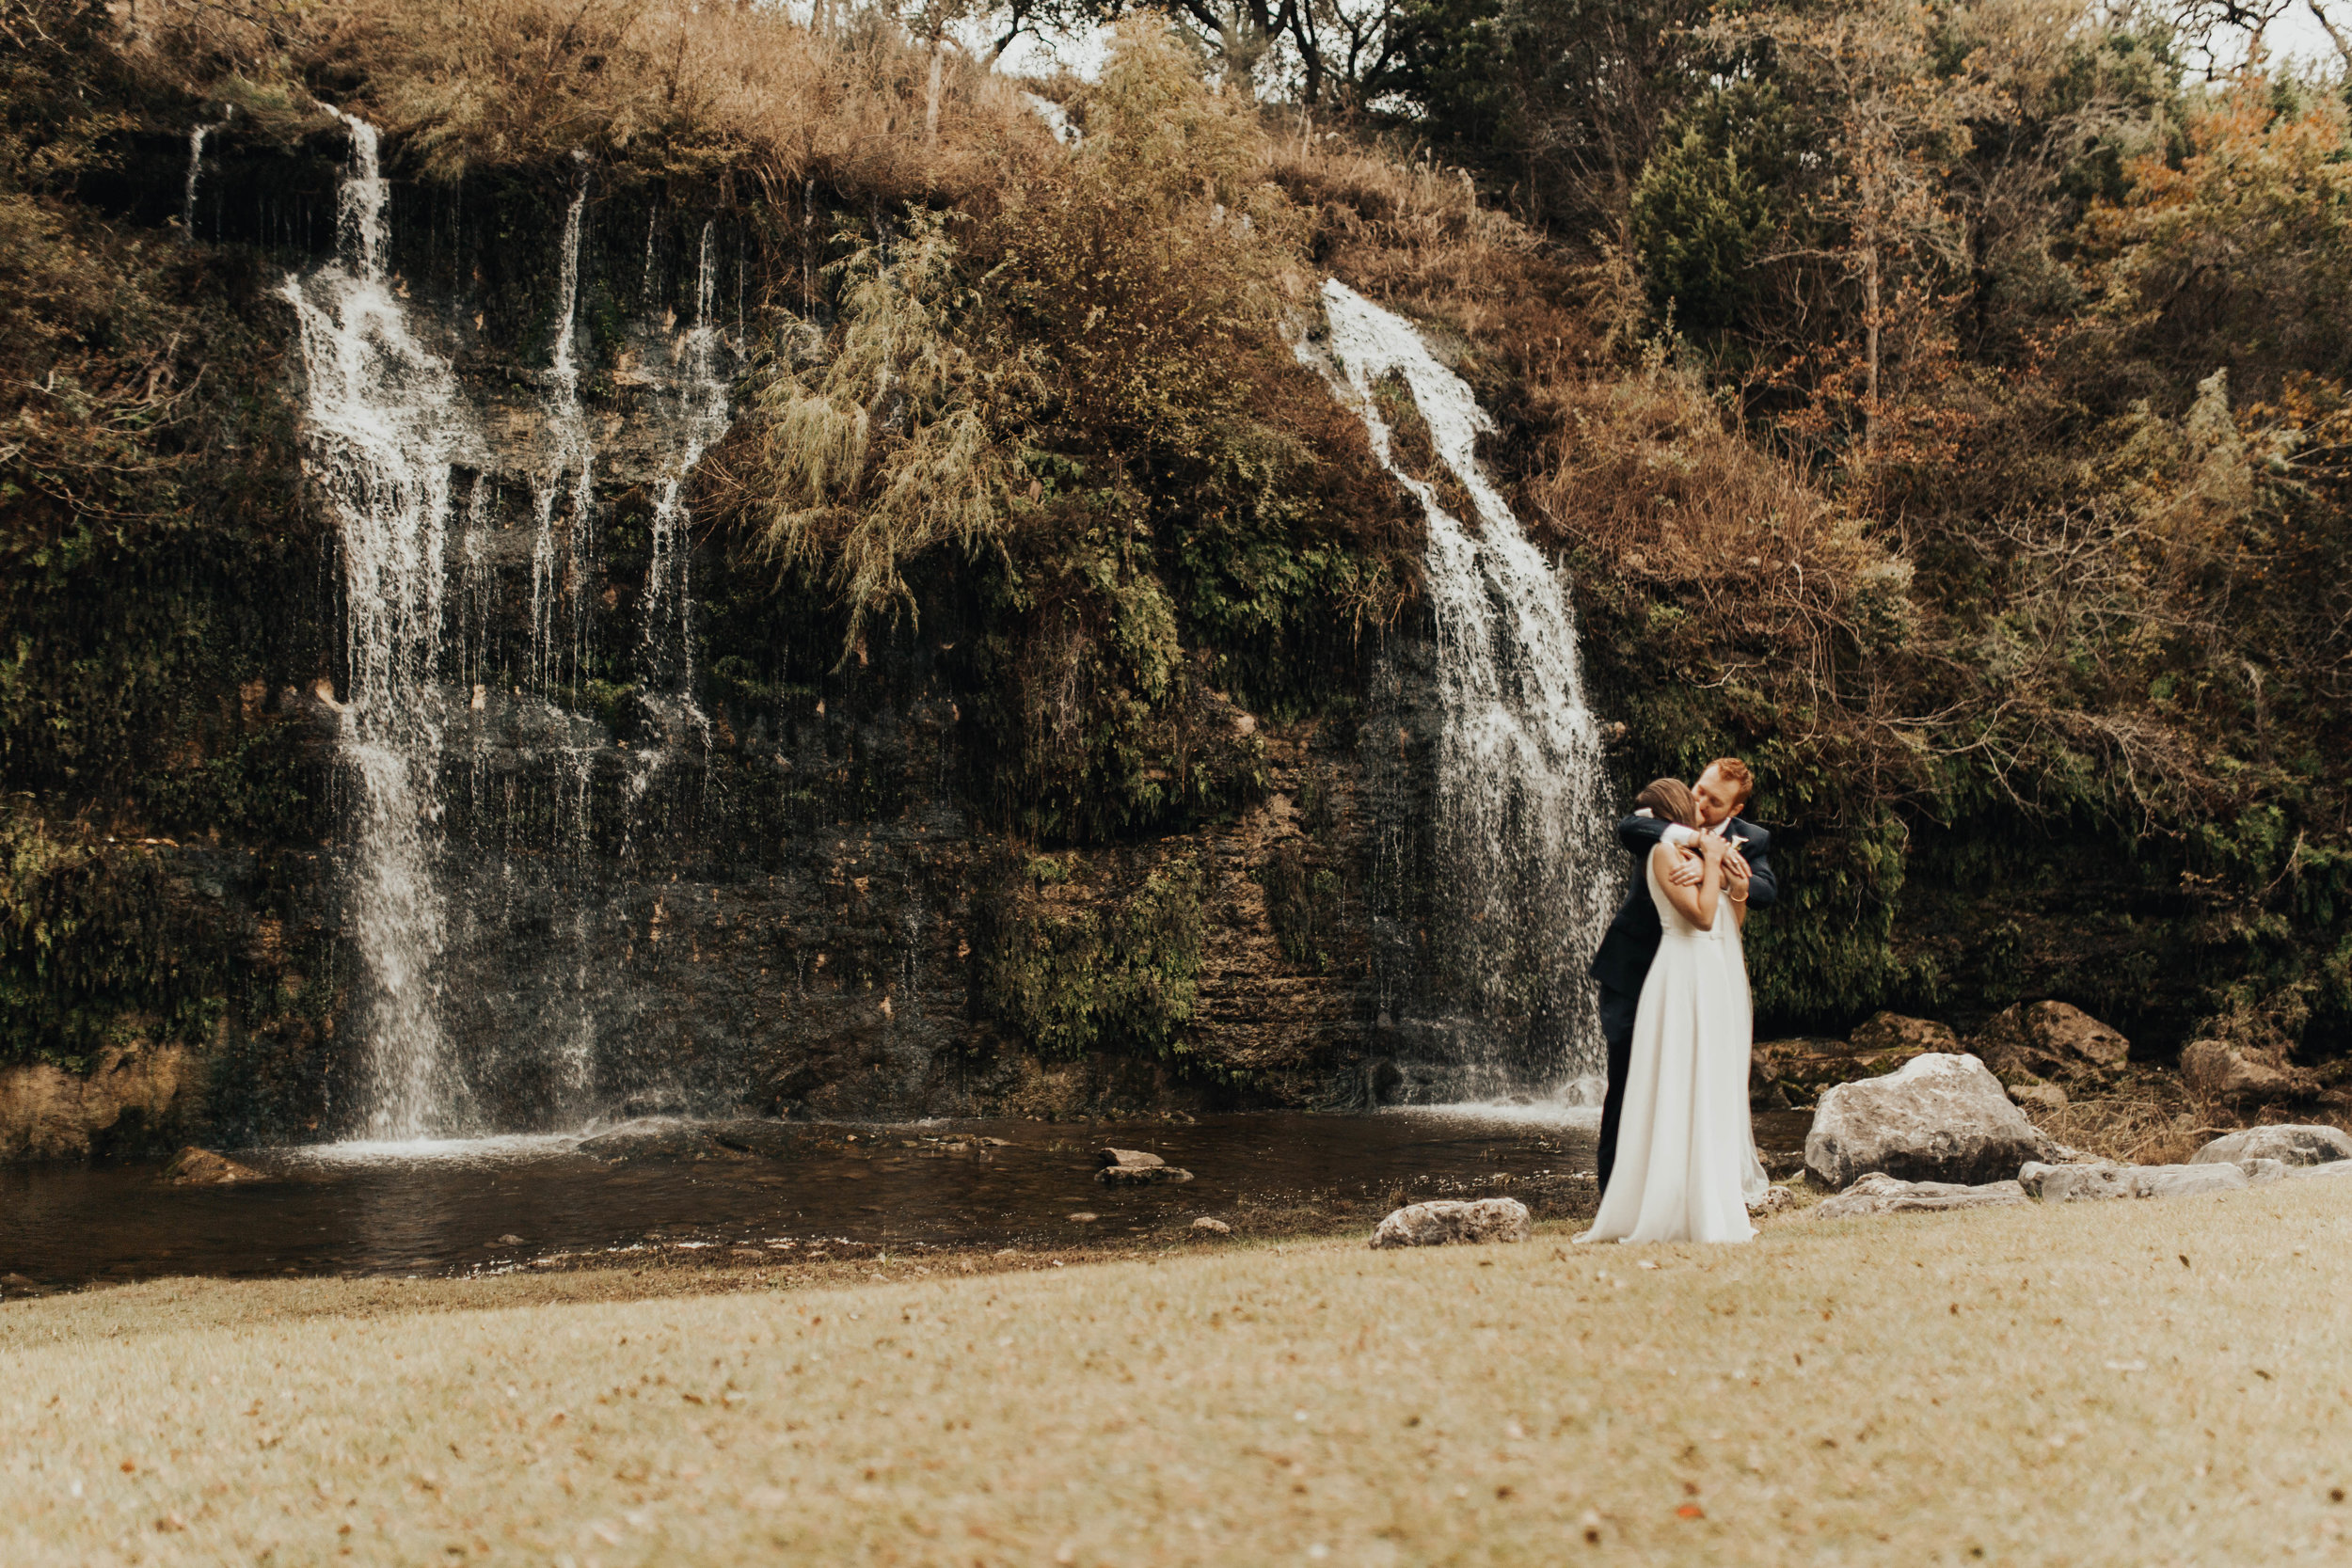 Brad_and_Karoline_Wedding-323.jpg